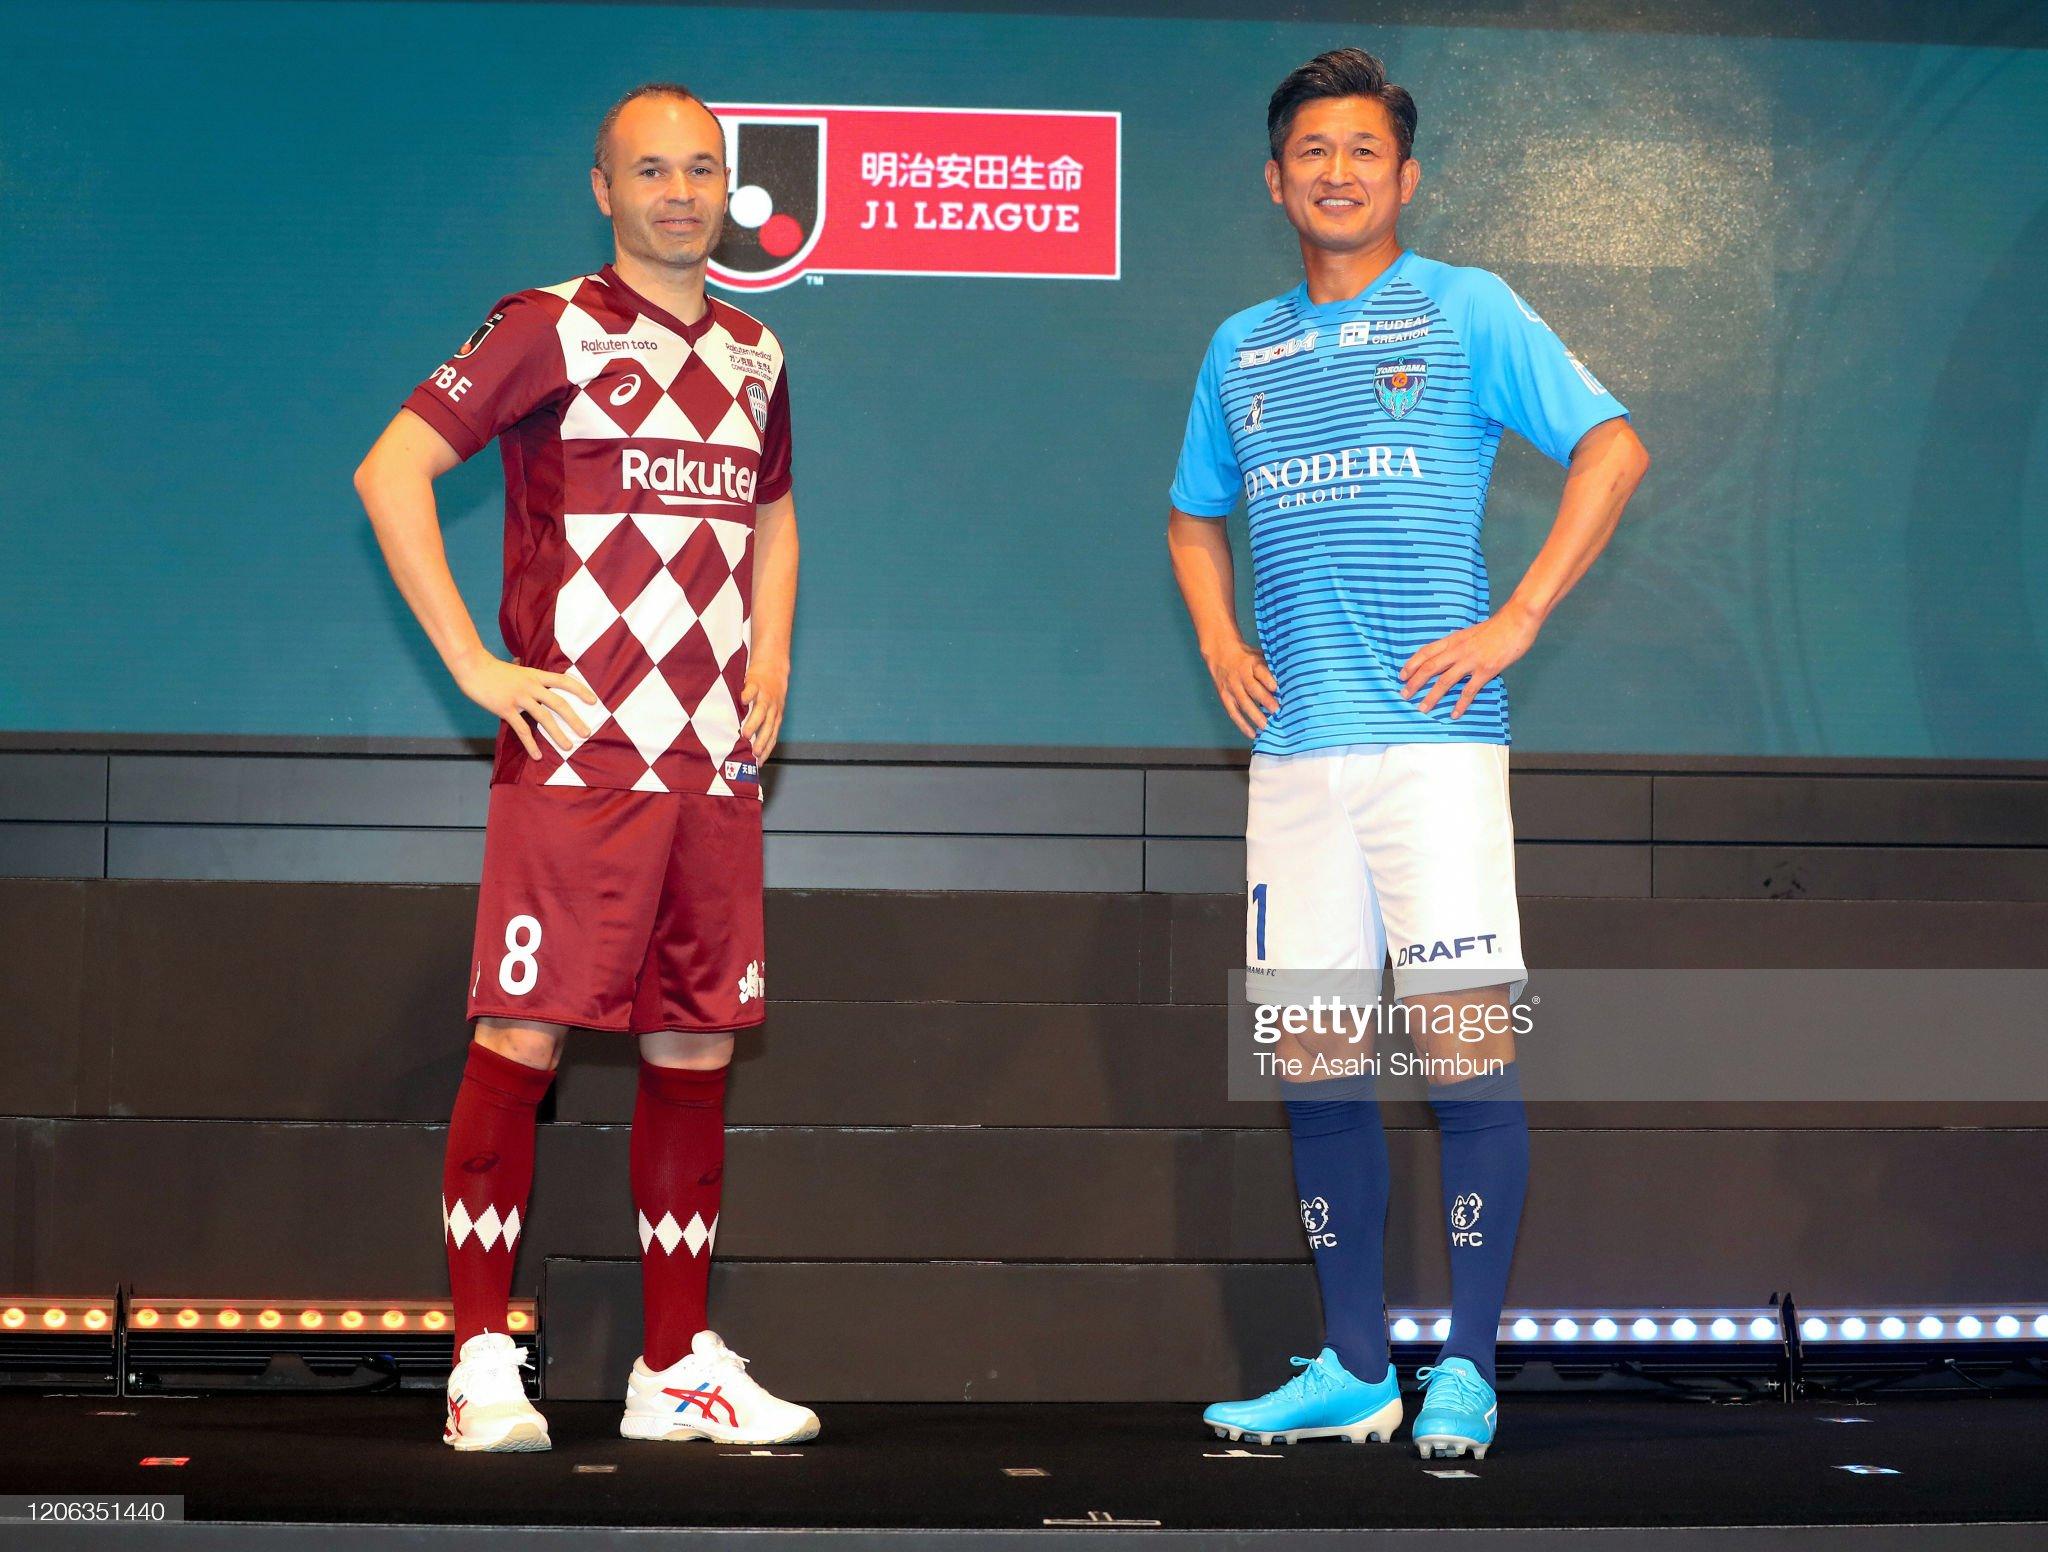 ¿Cuánto mide Kazuyoshi Miura? - Altura - Real height Kazuyoshi-miura-of-yokohama-fc-and-andres-iniesta-of-vissel-kobe-pose-picture-id1206351440?s=2048x2048